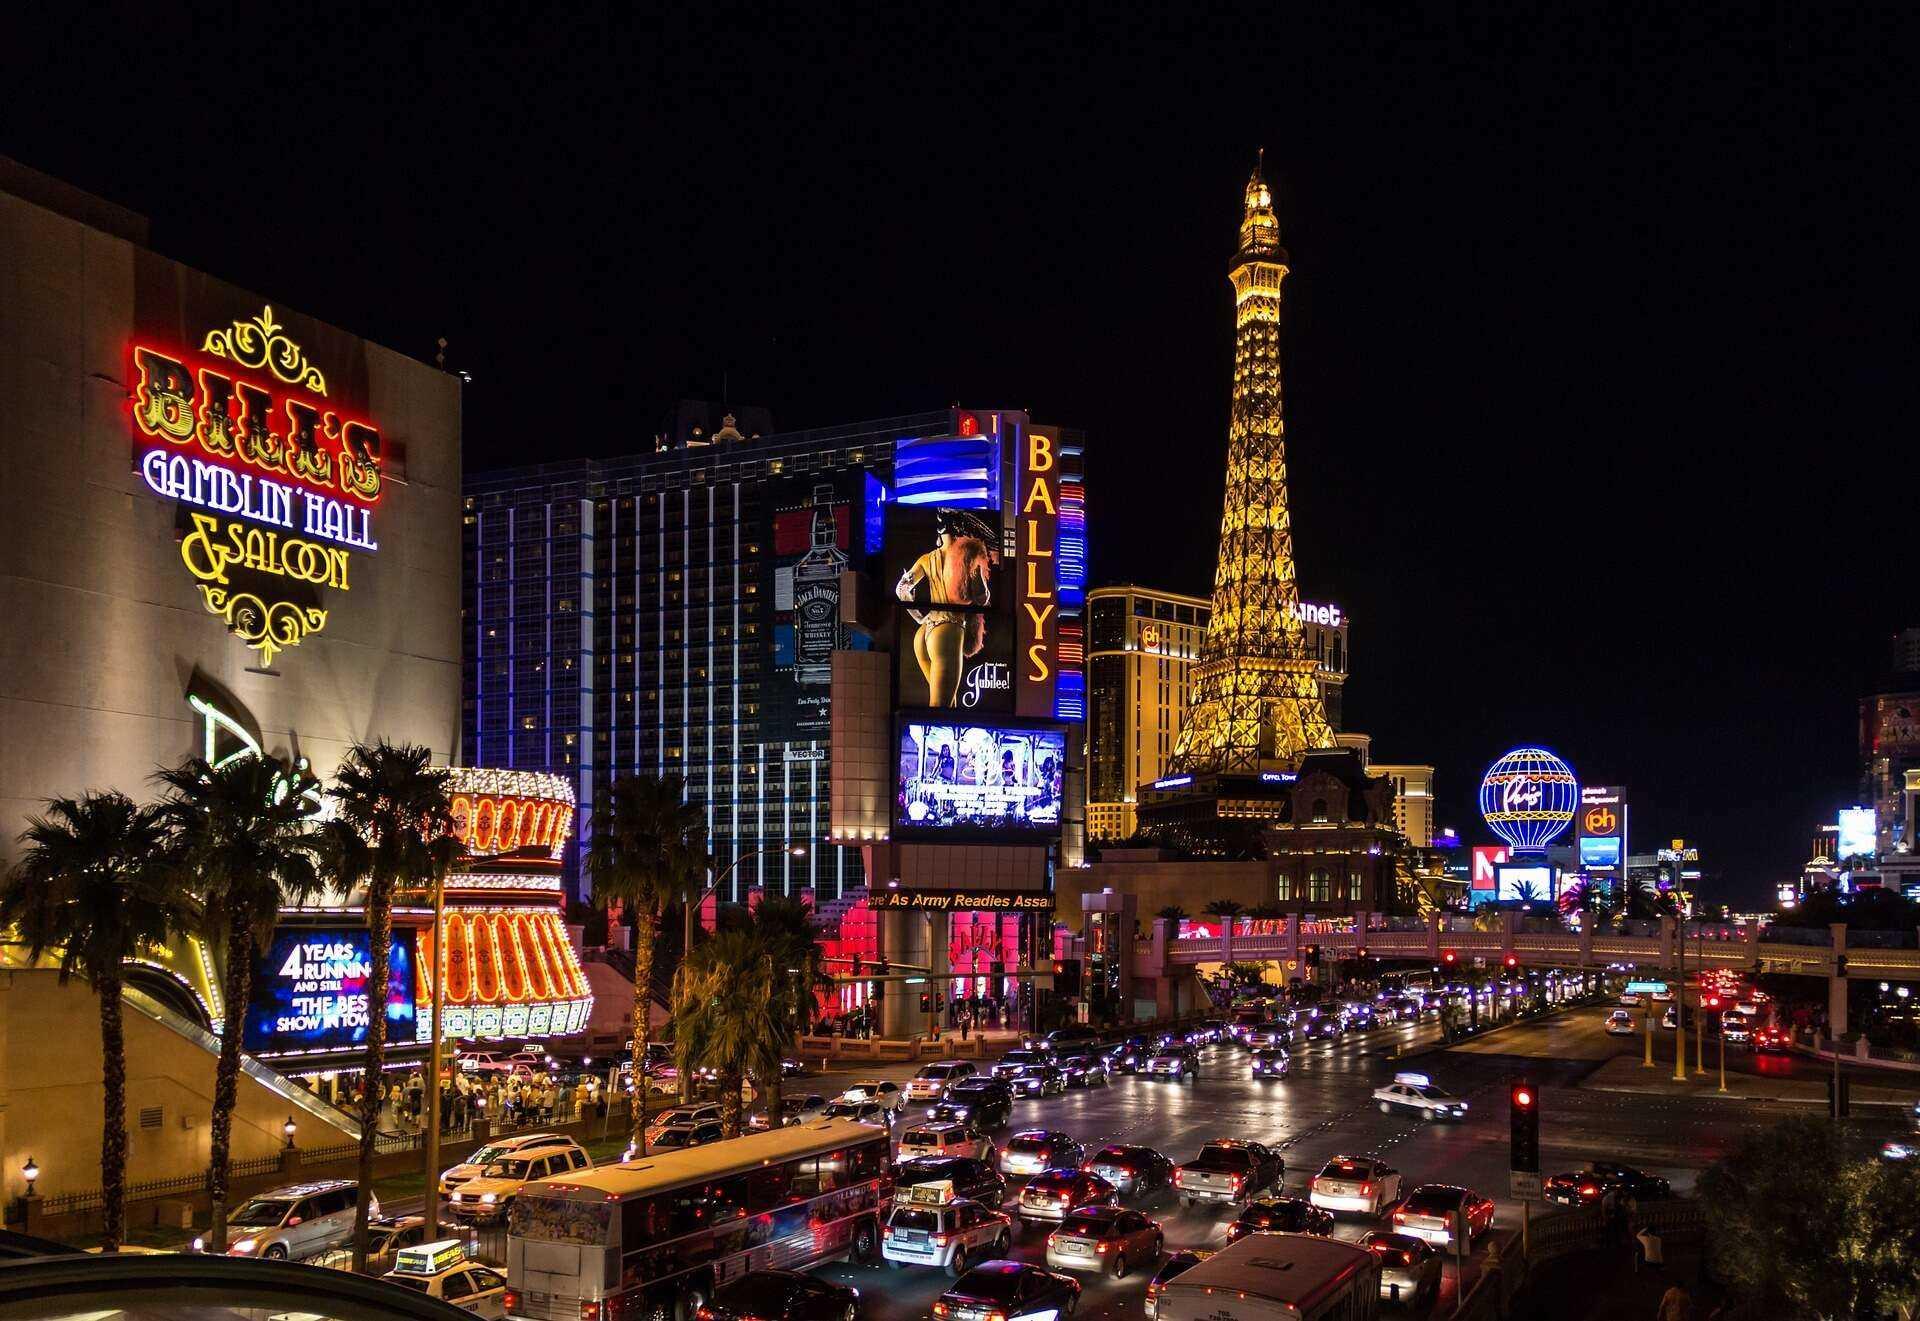 Direktflug Frankfurt Las Vegas Ab 232 Billigflug Finden Mit